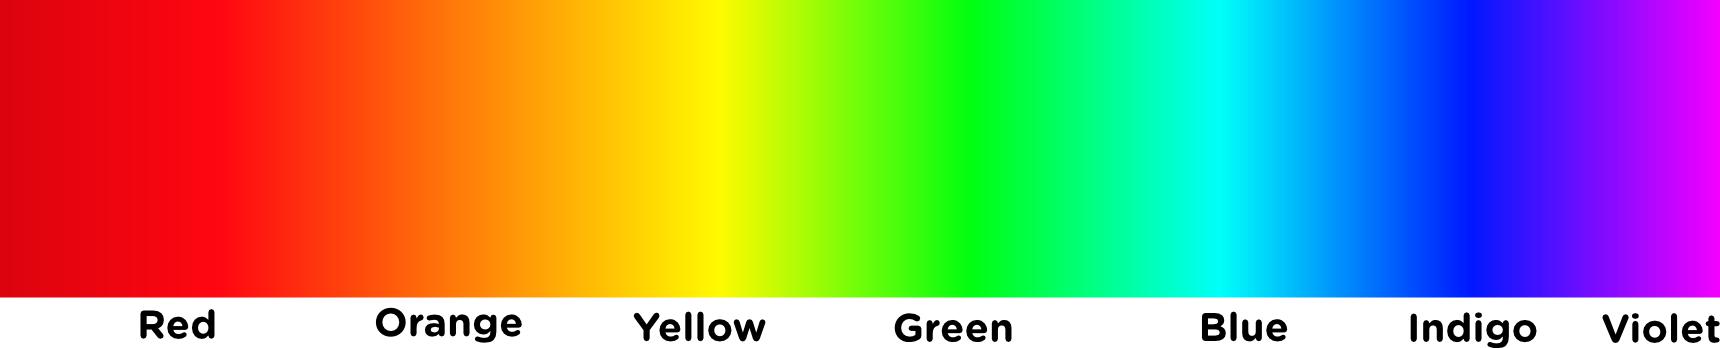 Light Color Spectrum